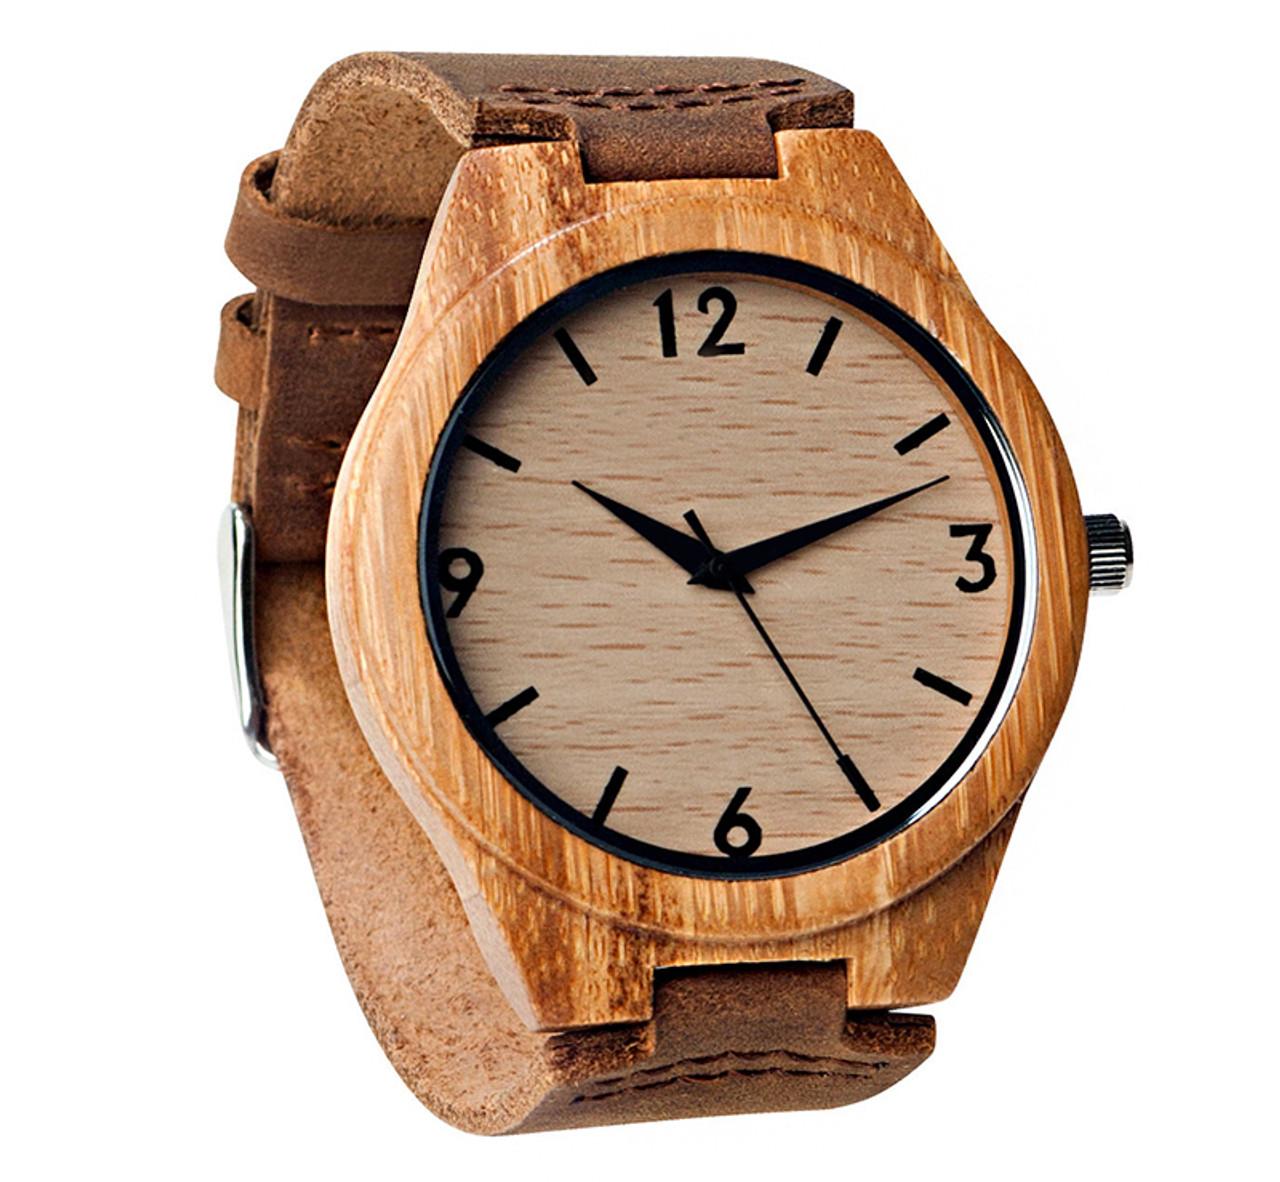 Grpn Spain - Wood Engraved Watch W#67 - Rival